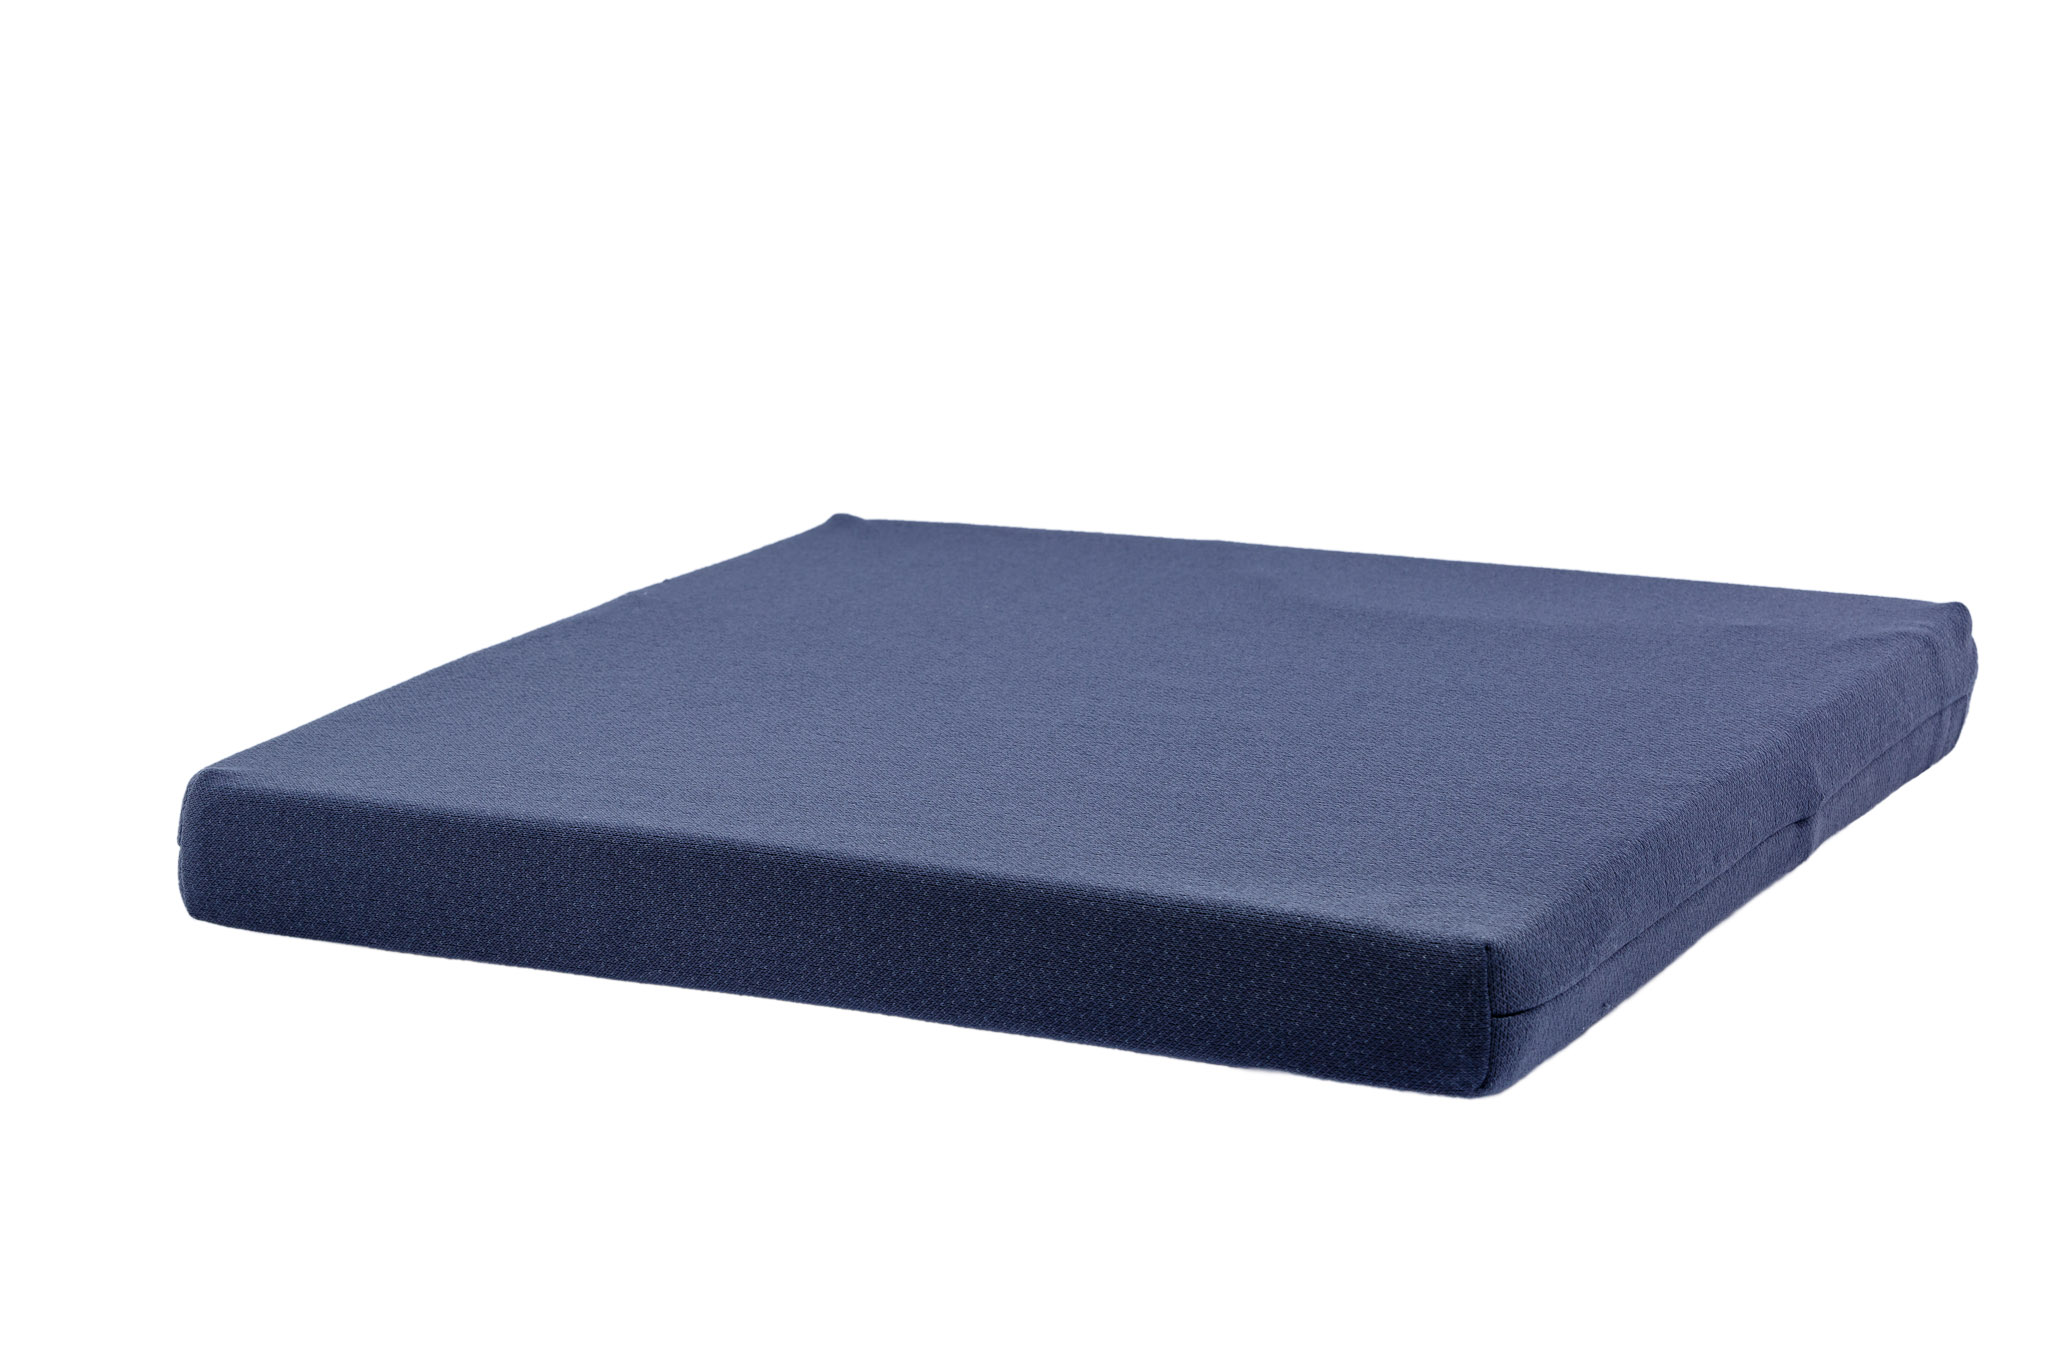 polster matratzen polster dapura. Black Bedroom Furniture Sets. Home Design Ideas